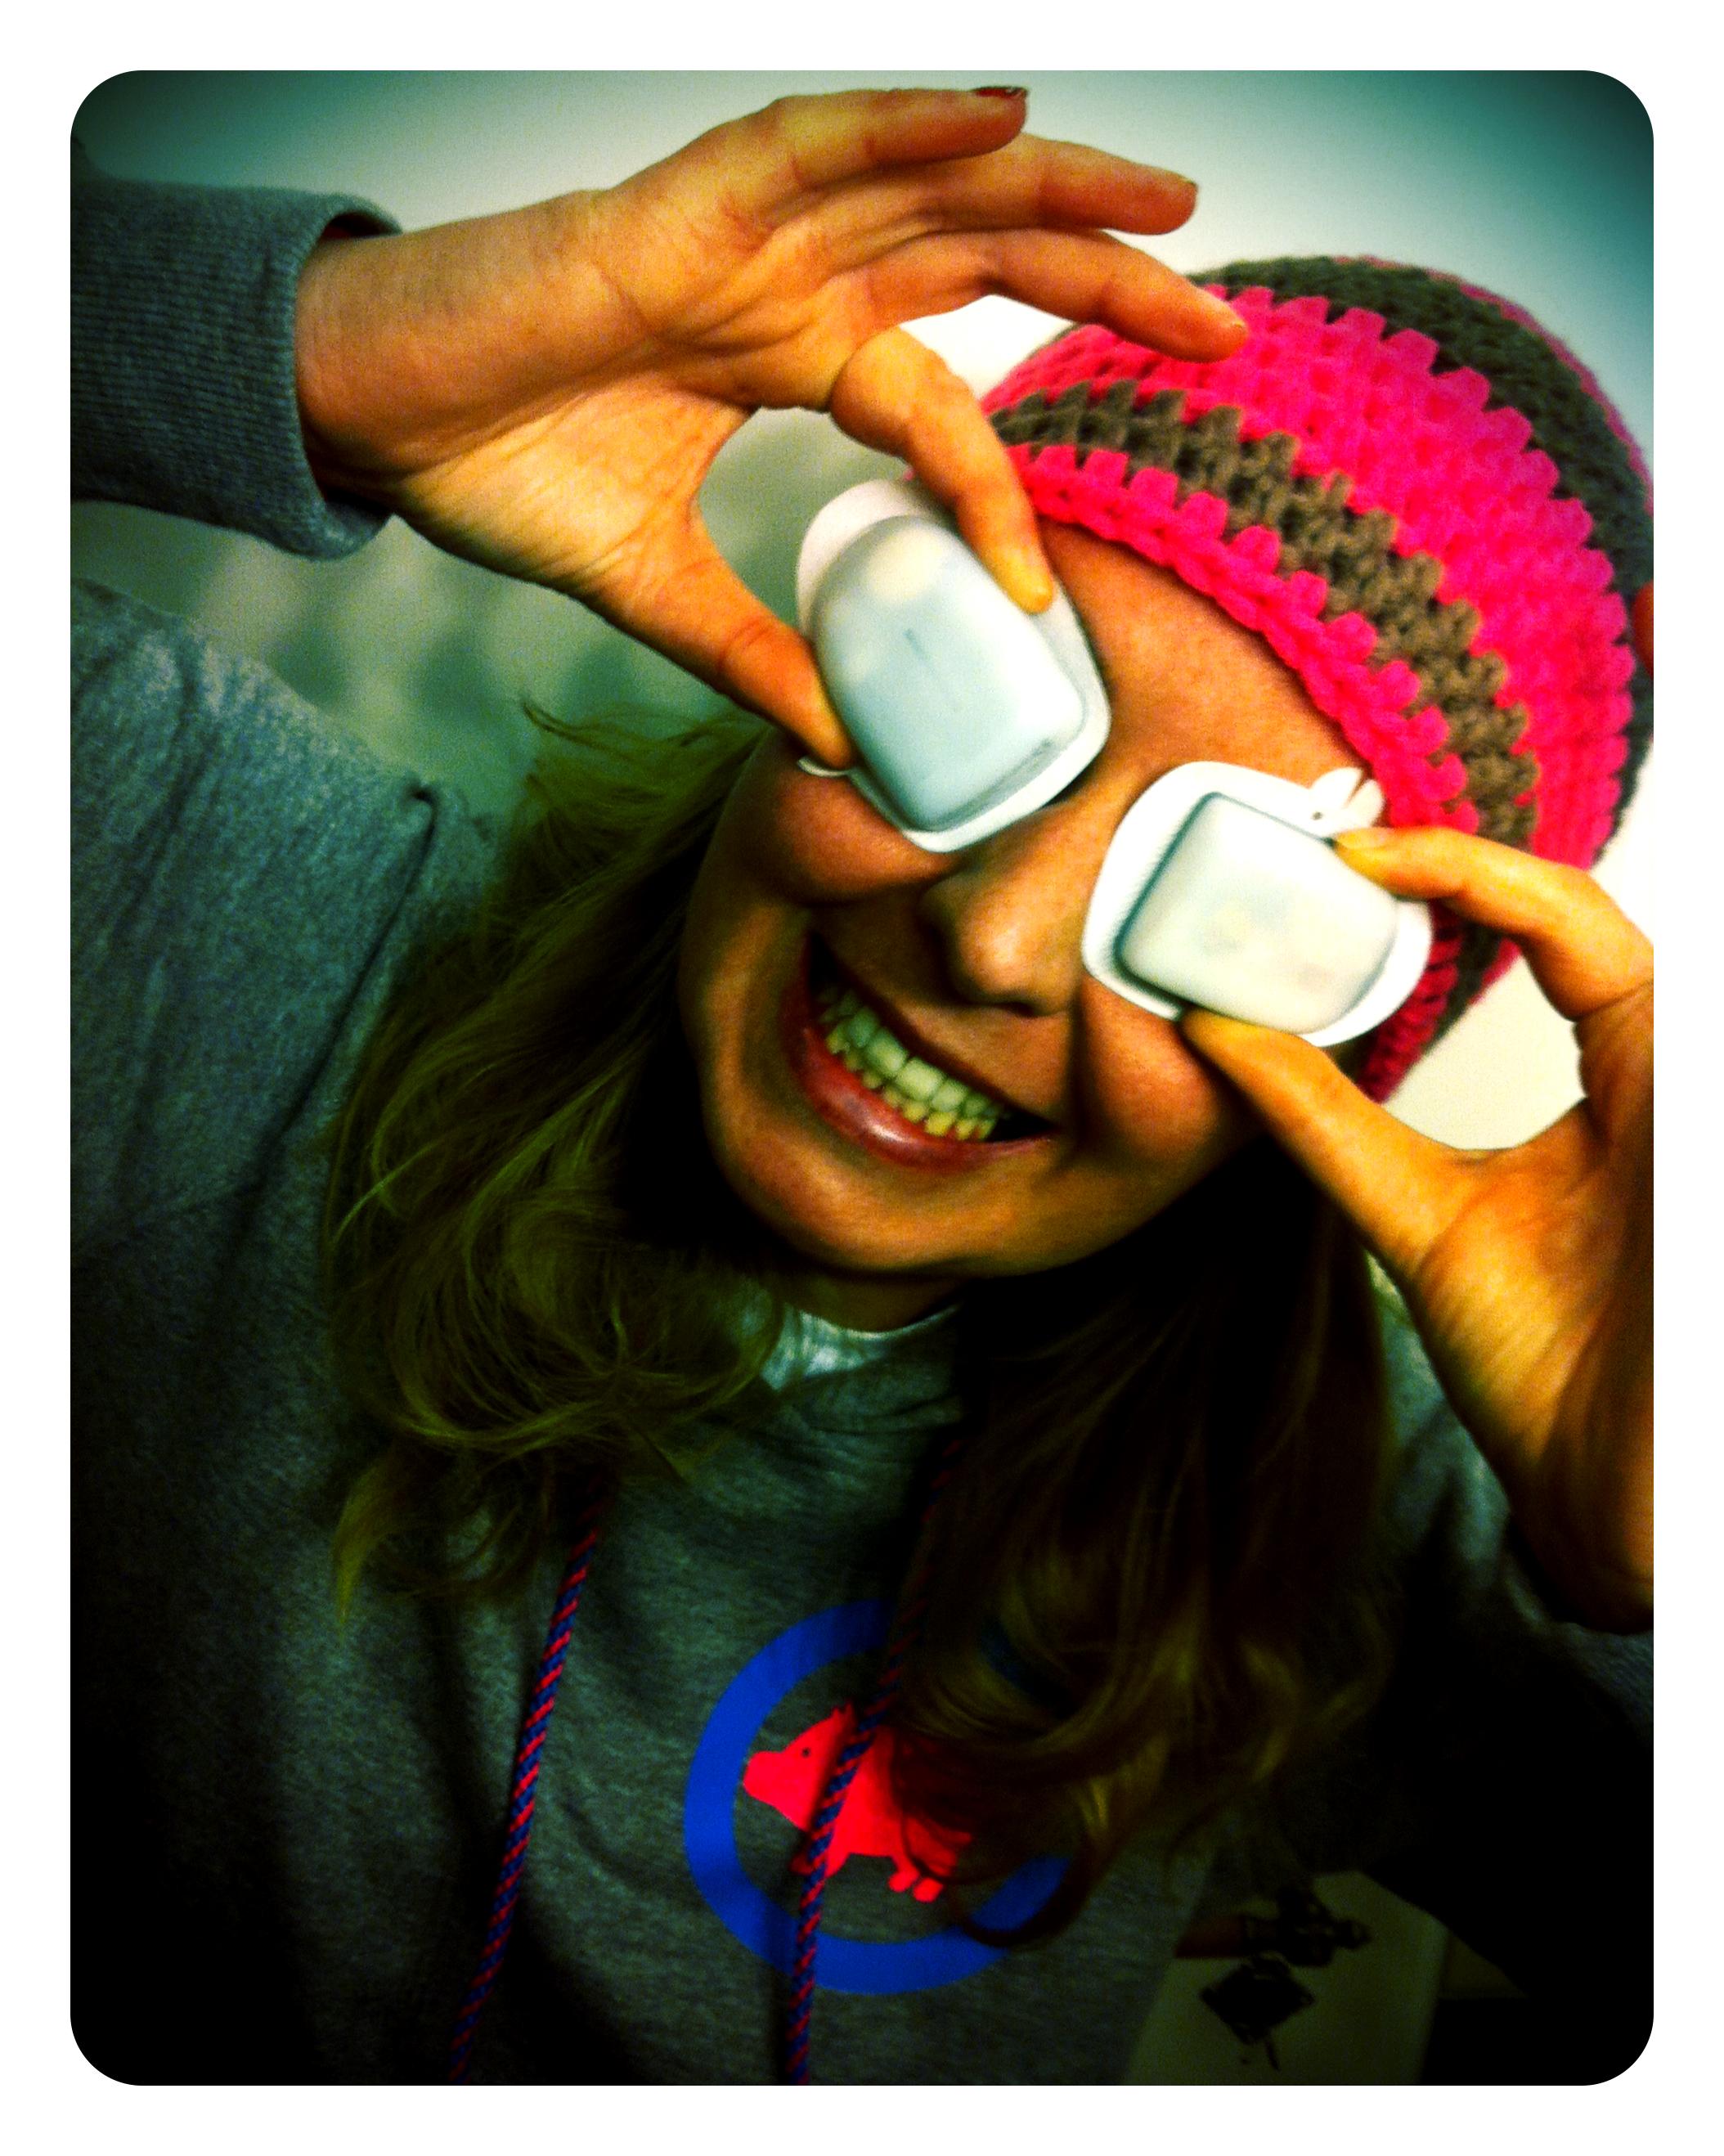 Anruf vom OmniPod persönlich - mein-diabetes-blog.com